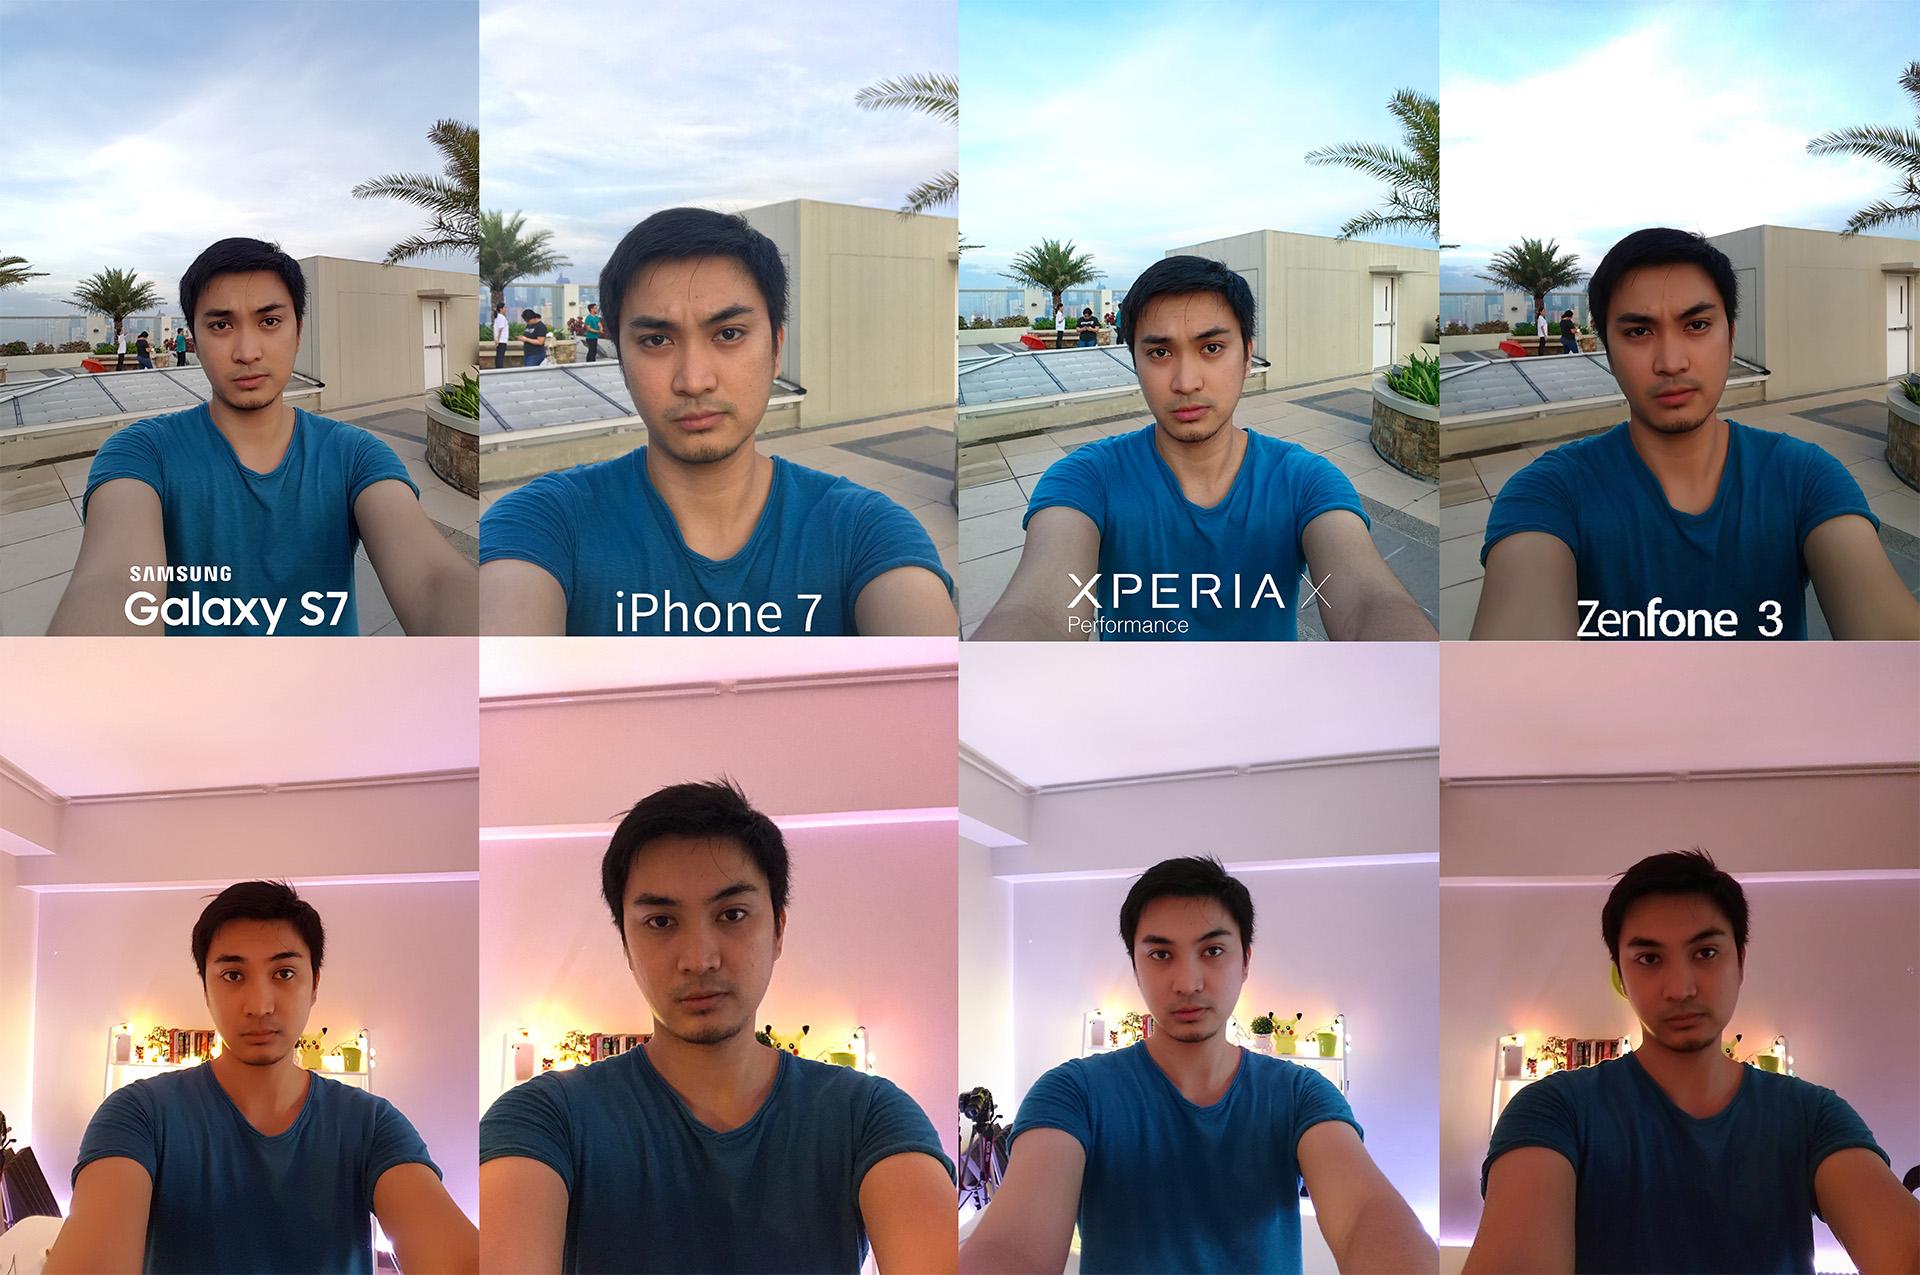 IPhone 7 Vs Galaxy S7 Zenfone 3 Xperia X Performance